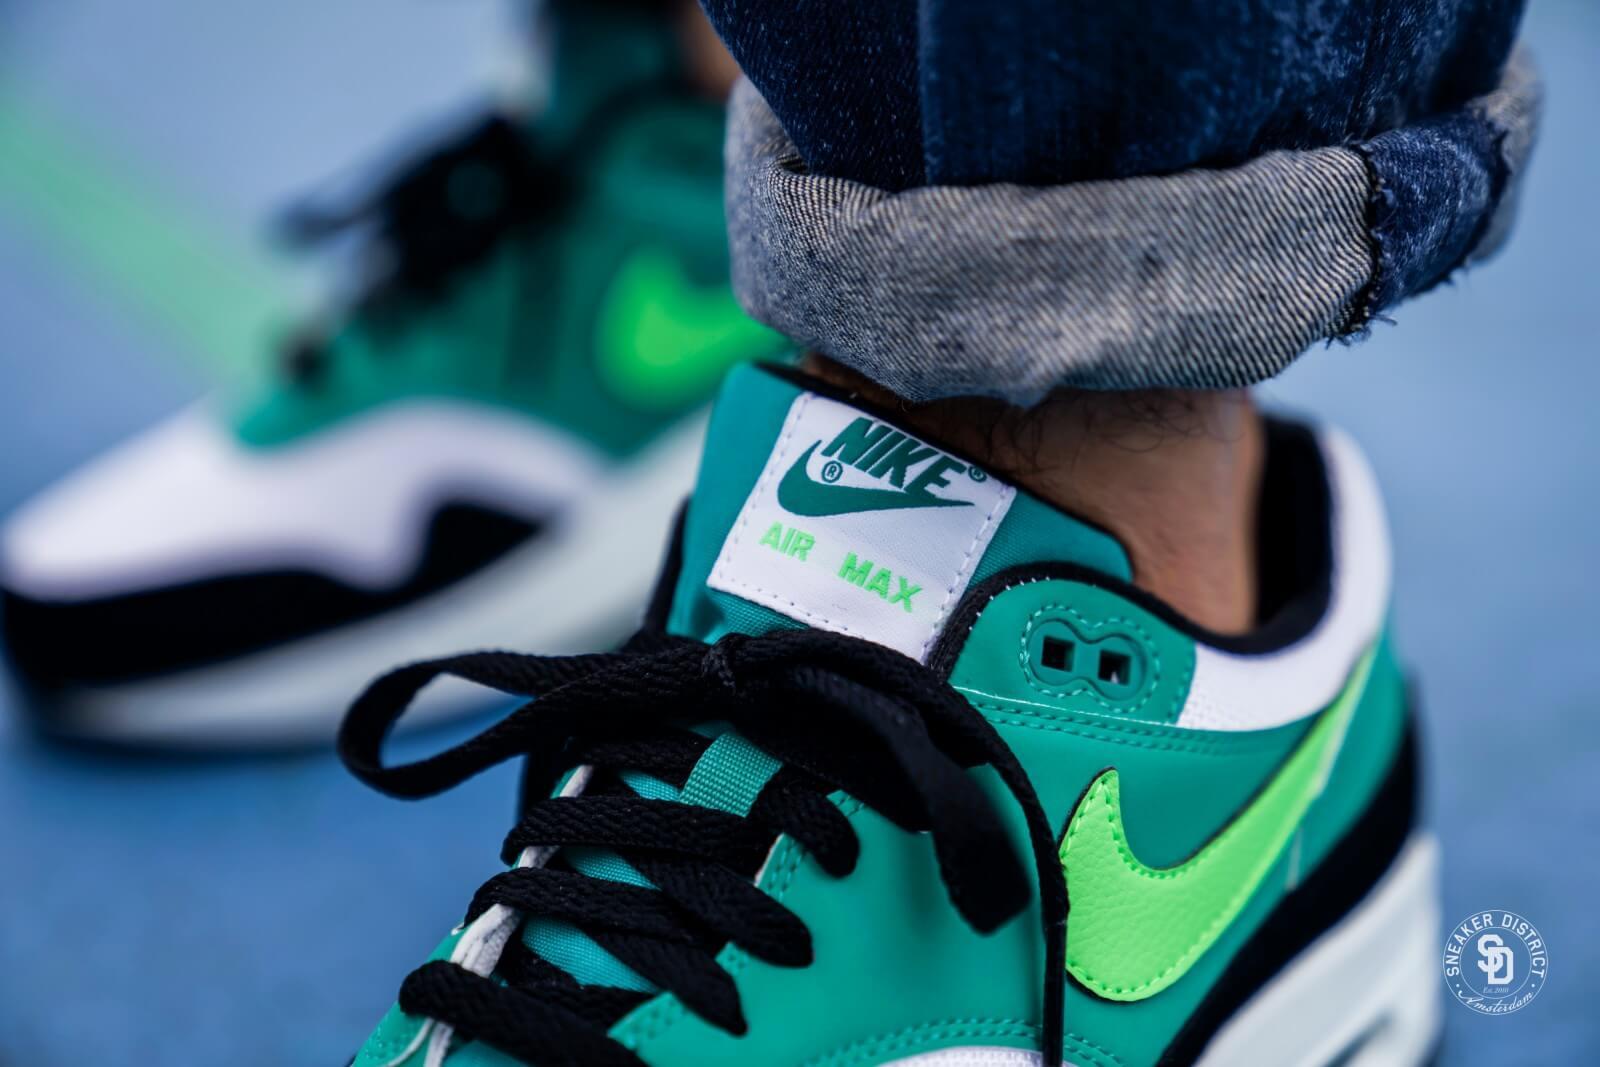 save off 6acea 63d71 france 2015 shoes women nike air max deep blue green 7fa72 9bfb9  discount  code for nike air max 1 white green strike neptune green 27087 5e5d9